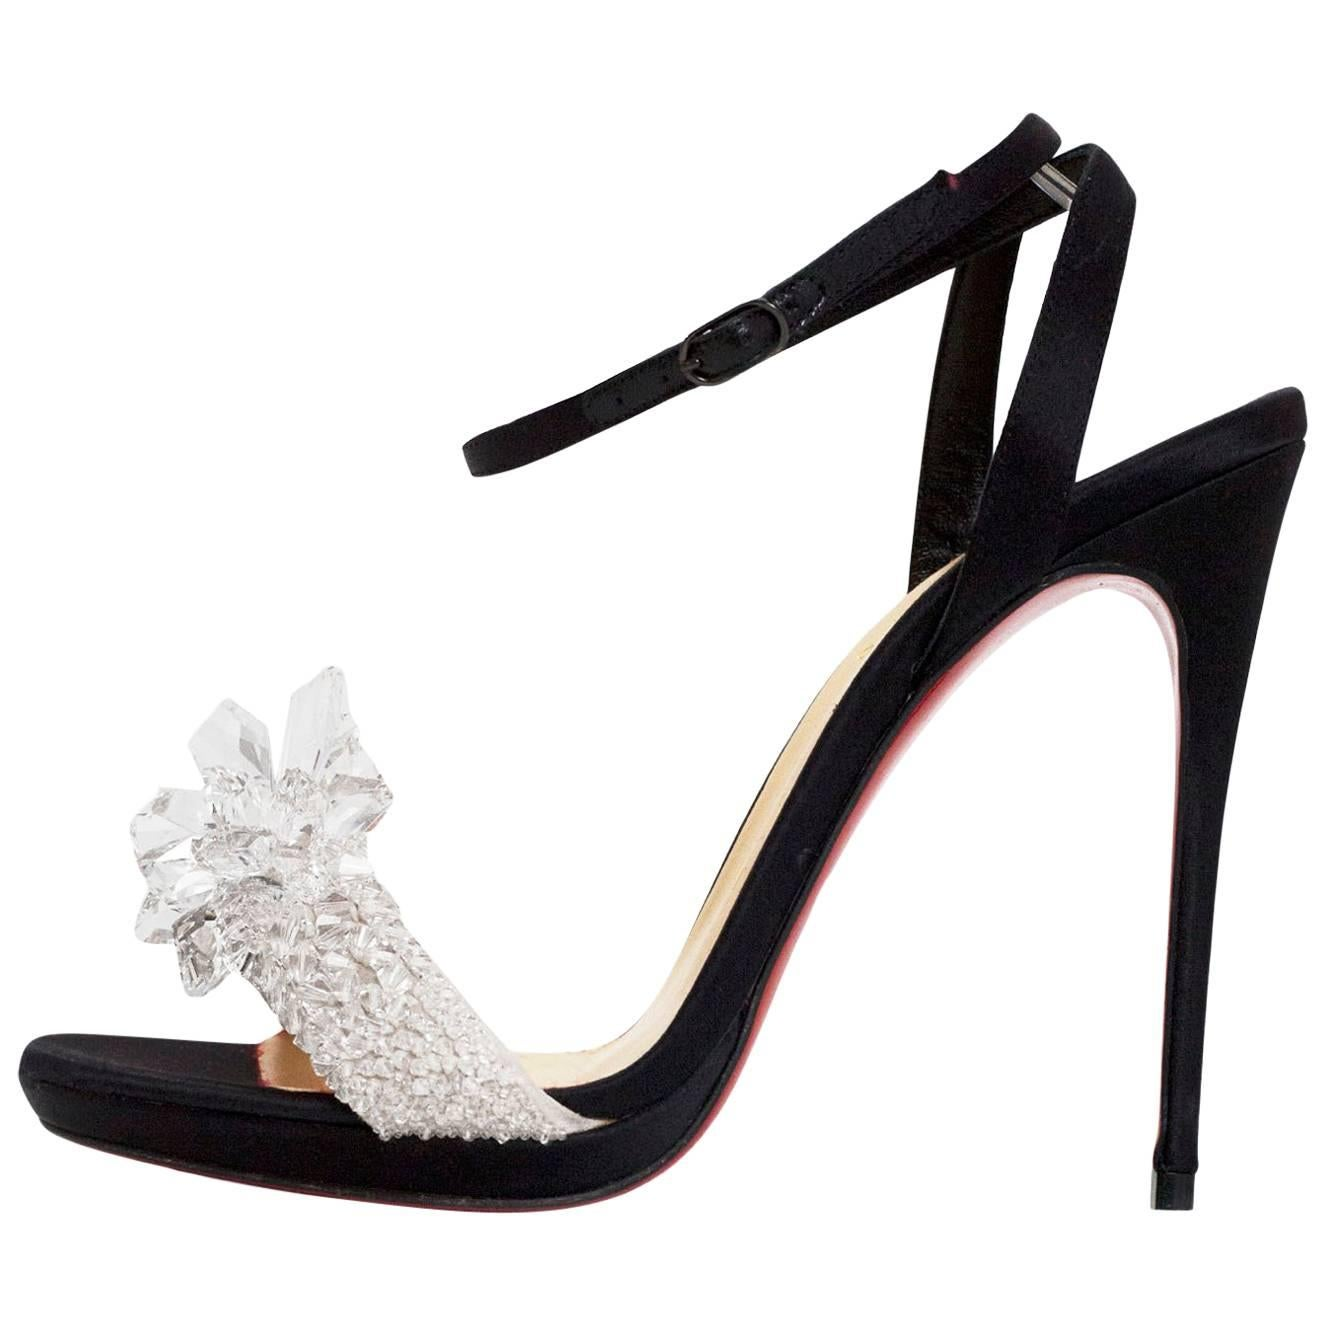 d238a81b92f australia louboutin black heel queen 7265f 8f1a7